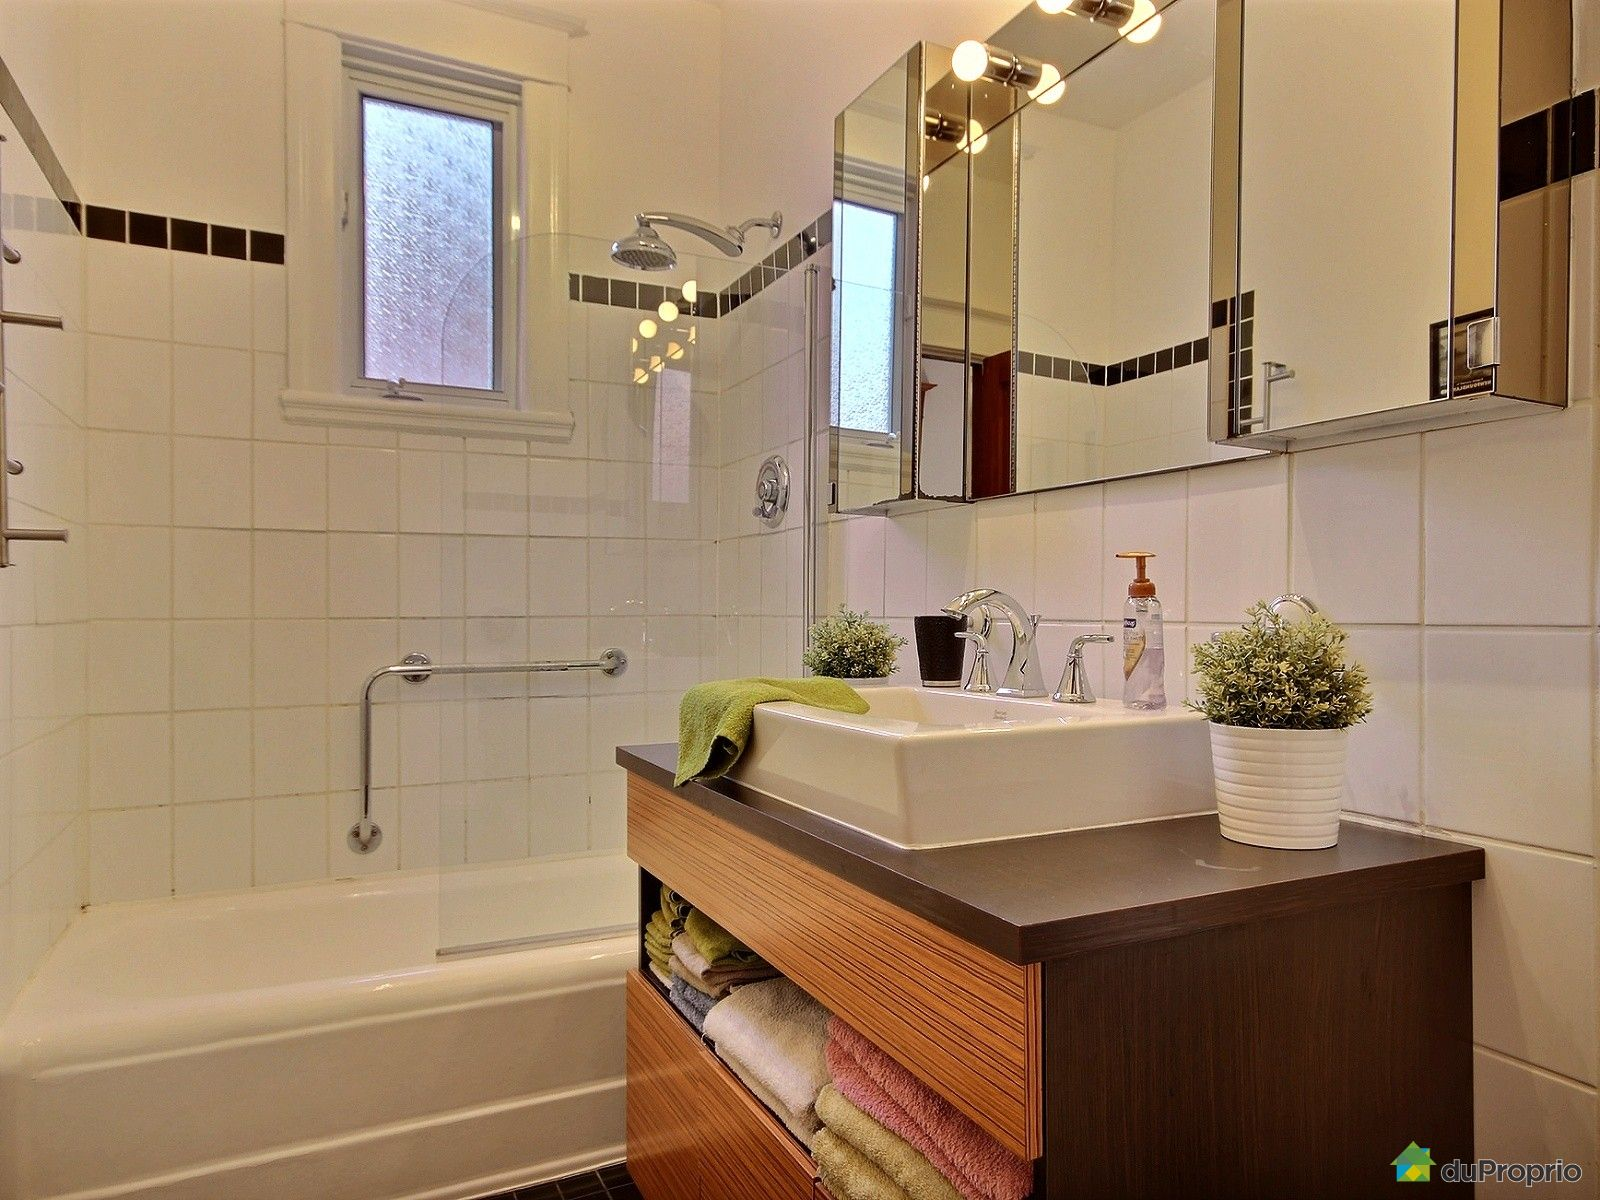 condo vendre montr al 2374 rue nicolet immobilier qu bec duproprio 696508. Black Bedroom Furniture Sets. Home Design Ideas